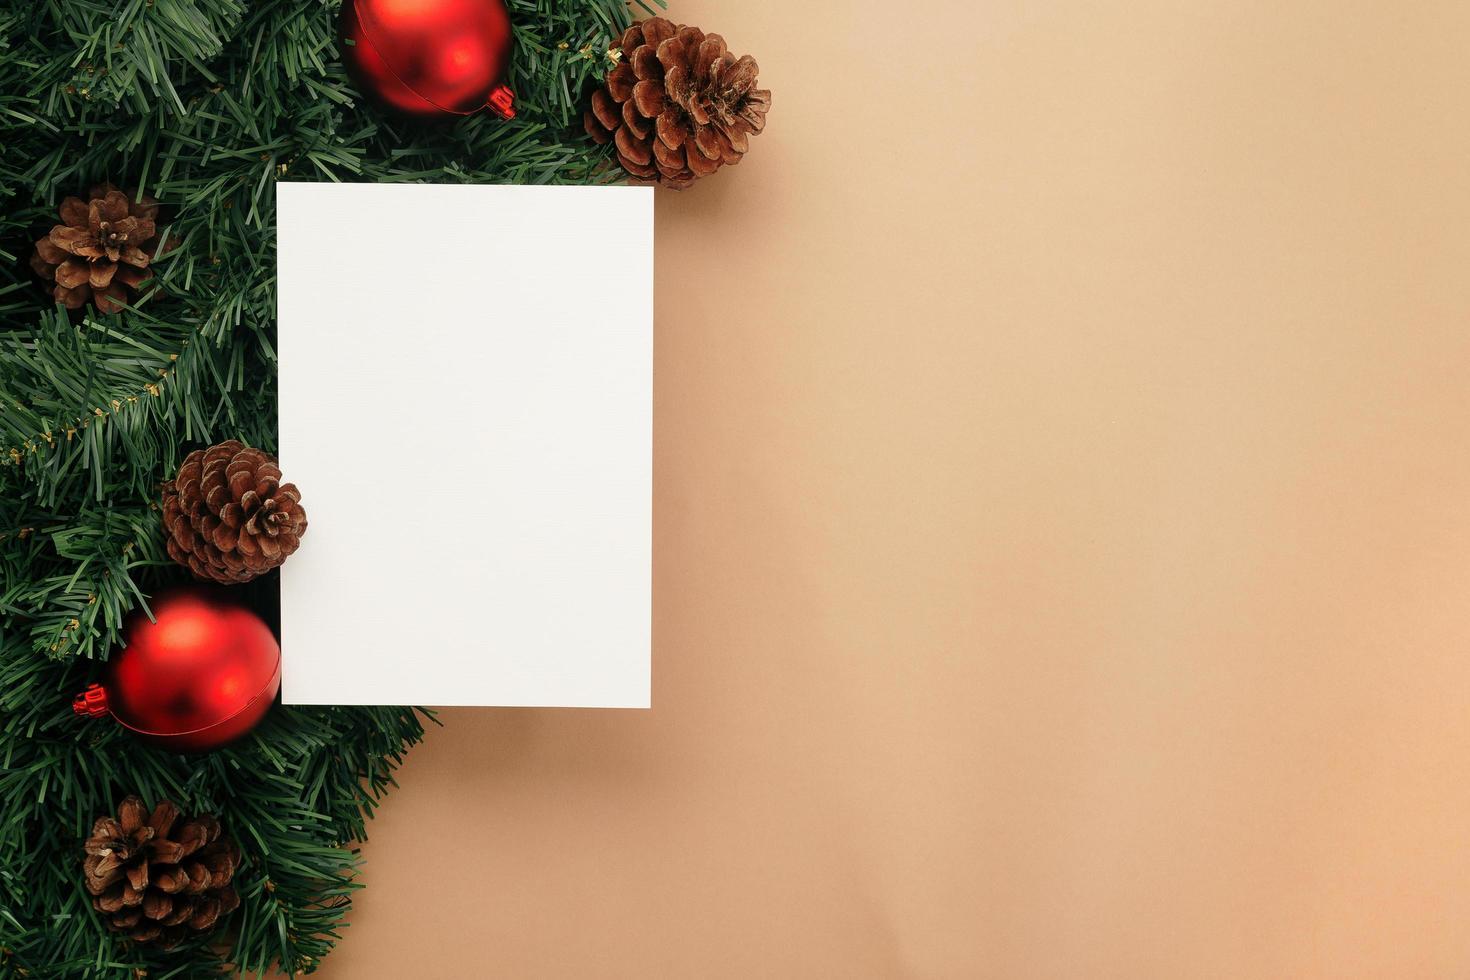 Merry Christmas greeting card mockup template photo